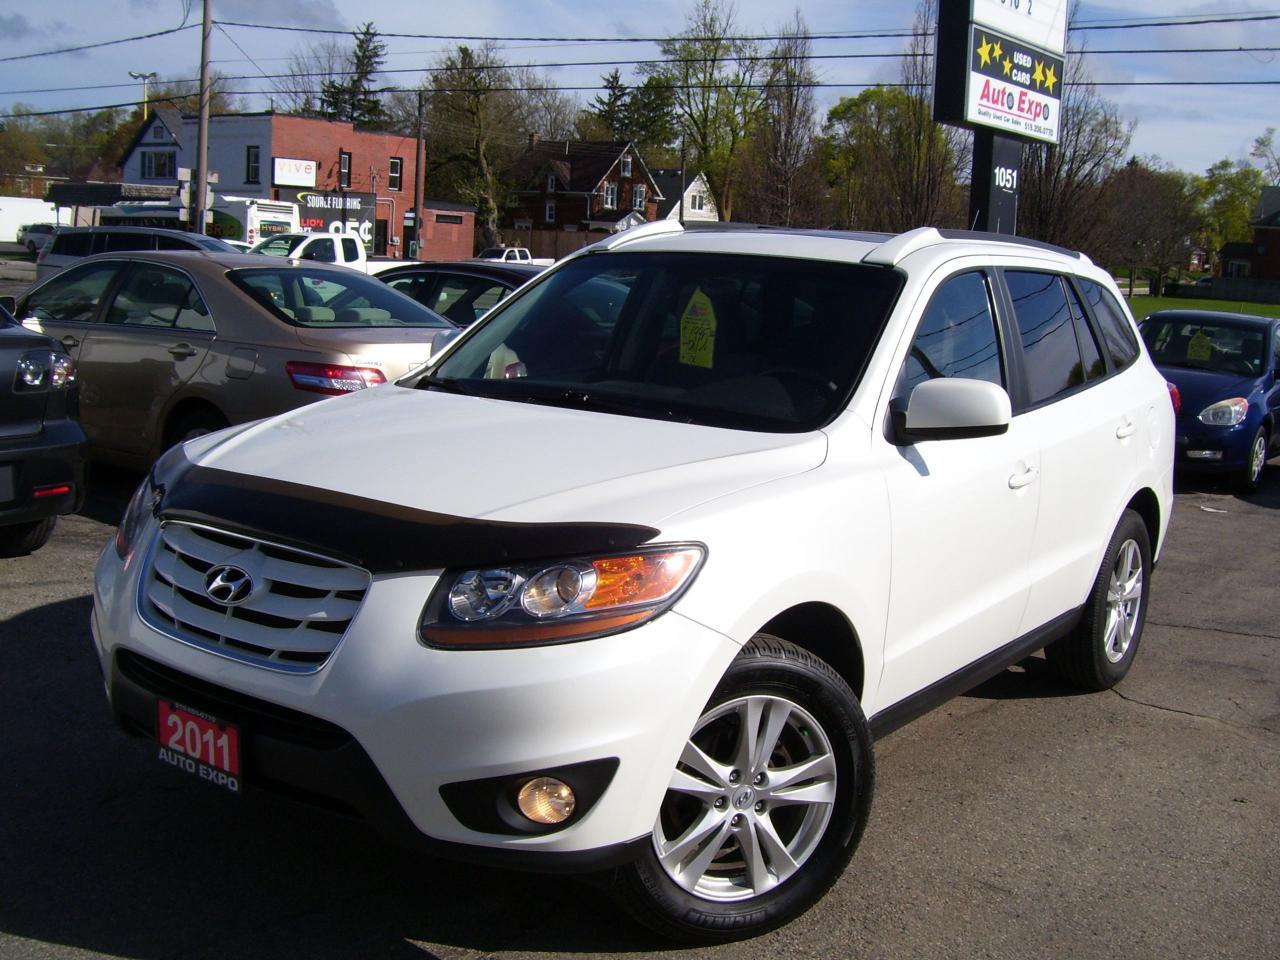 2011 Hyundai Santa Fe GL,ONE OWNER,NO ACCIDENT,SUNROOF,BLUETOOTH,TINTED